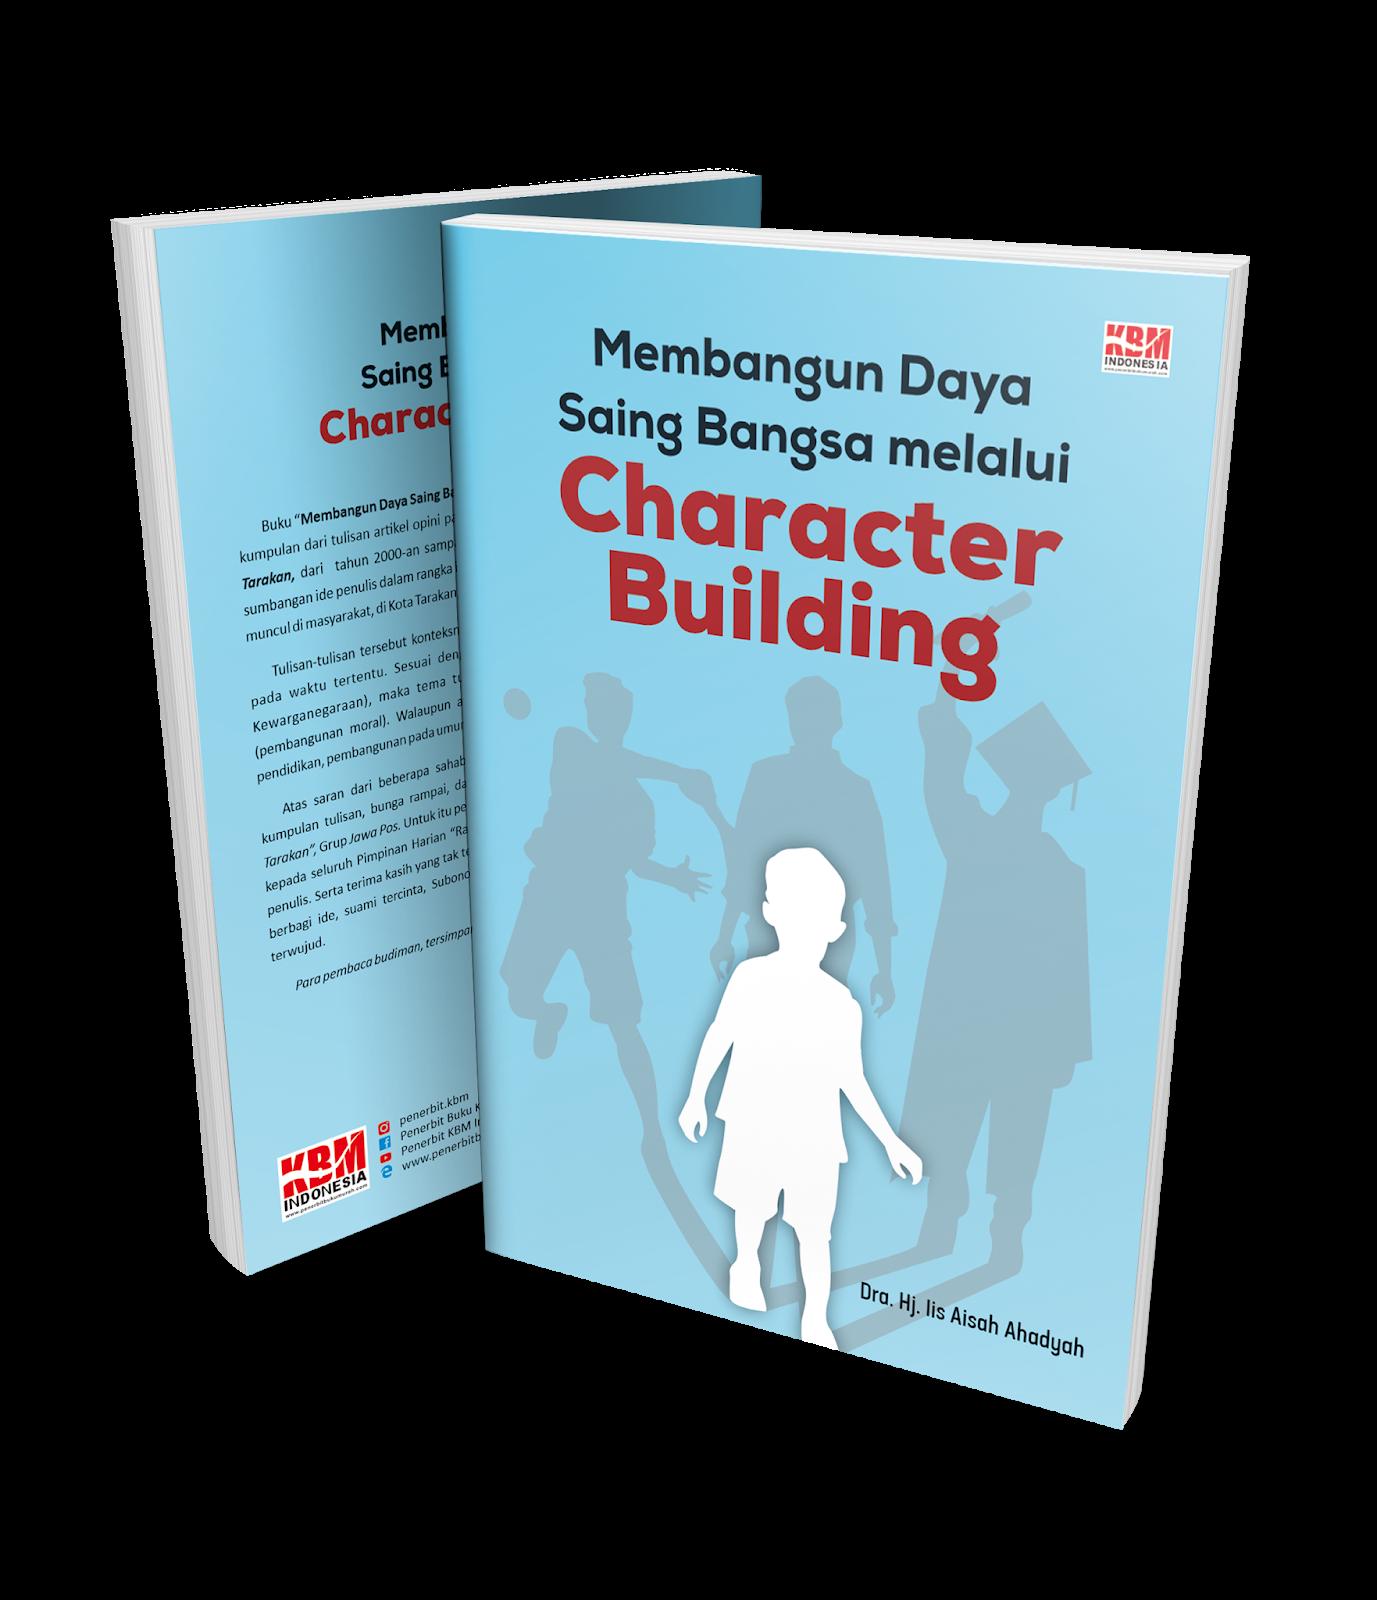 MEMBANGUN DAYA SAING BANGSA MELALUI CHARACTER BUILDING